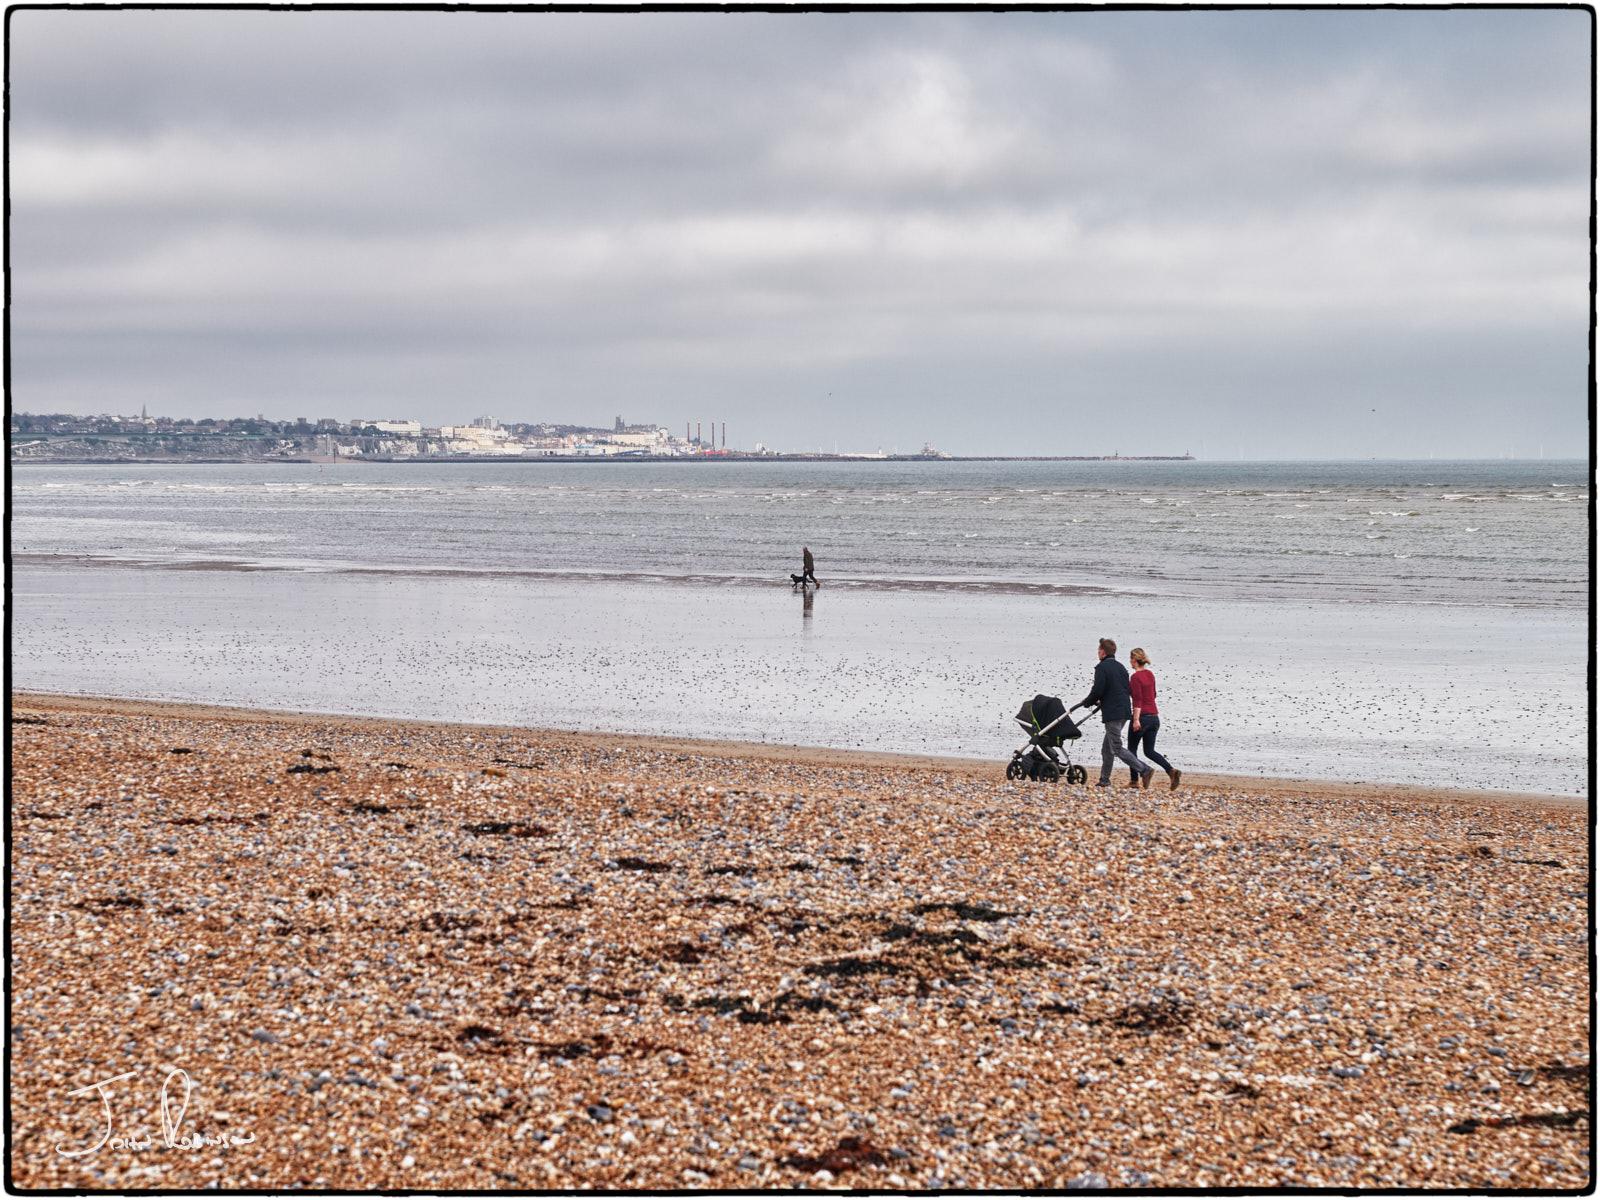 Walking on the beach, late-autumn, Sandwich Bay, Kent